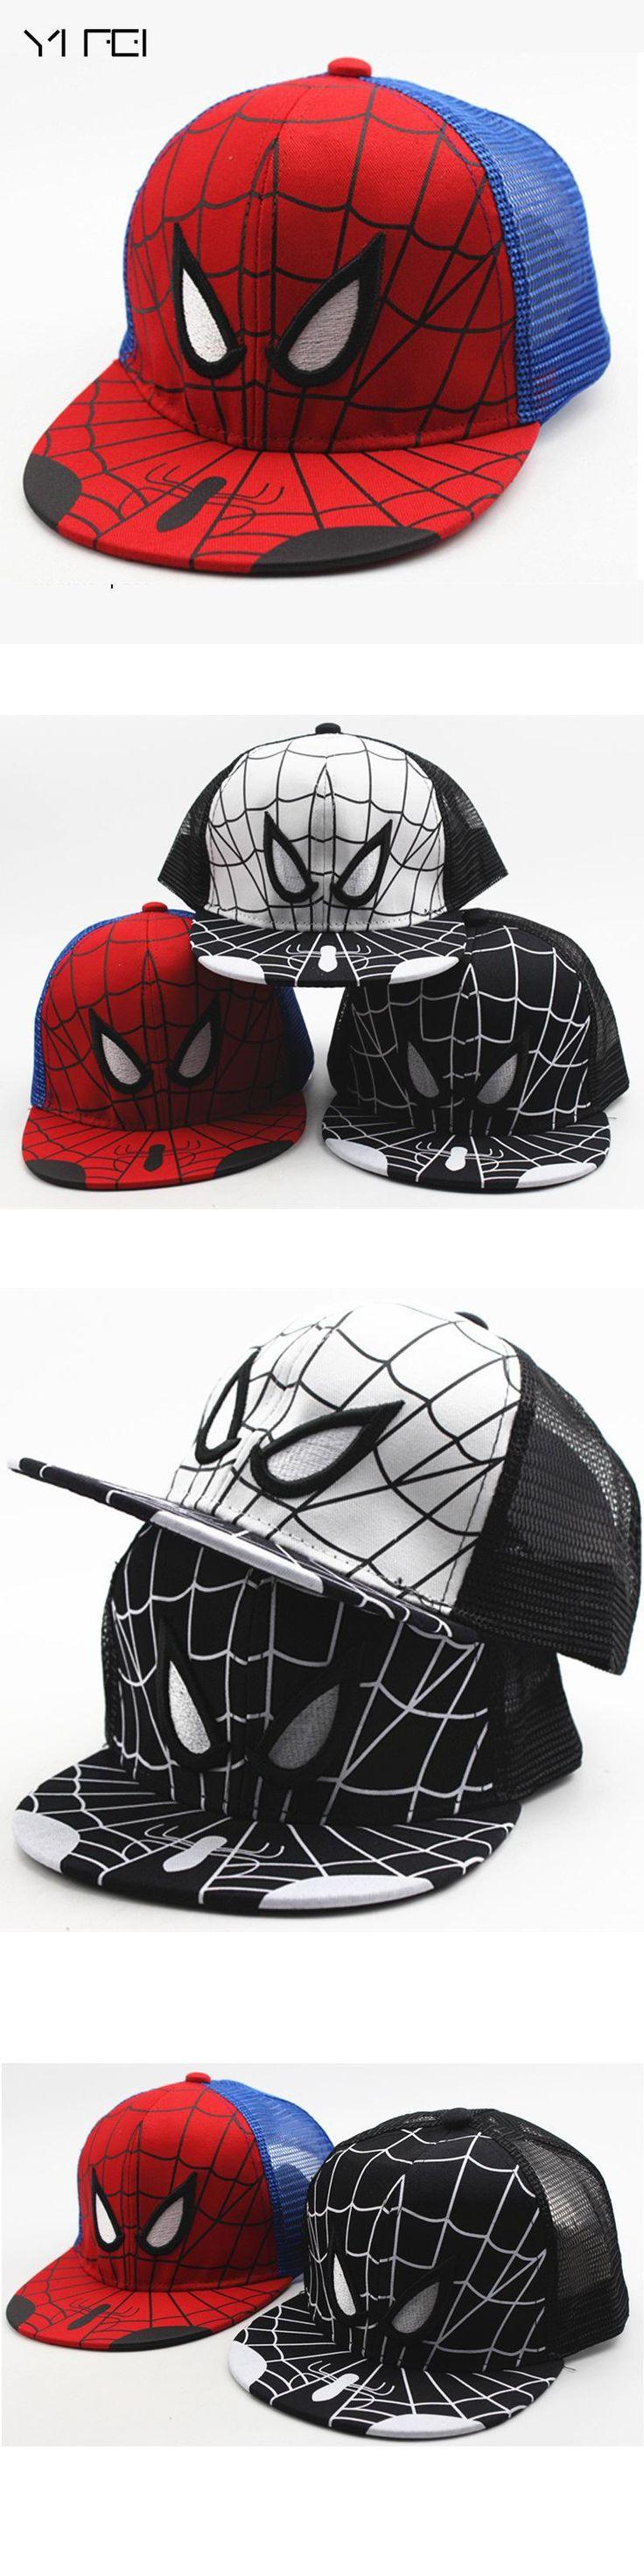 YIFEI Cartoon Kids Baseball Cap Fashion Spider-man Boys Snapback Caps Cosplay Hip Hop Baseball Cap Children Summer Hats Sun Hat